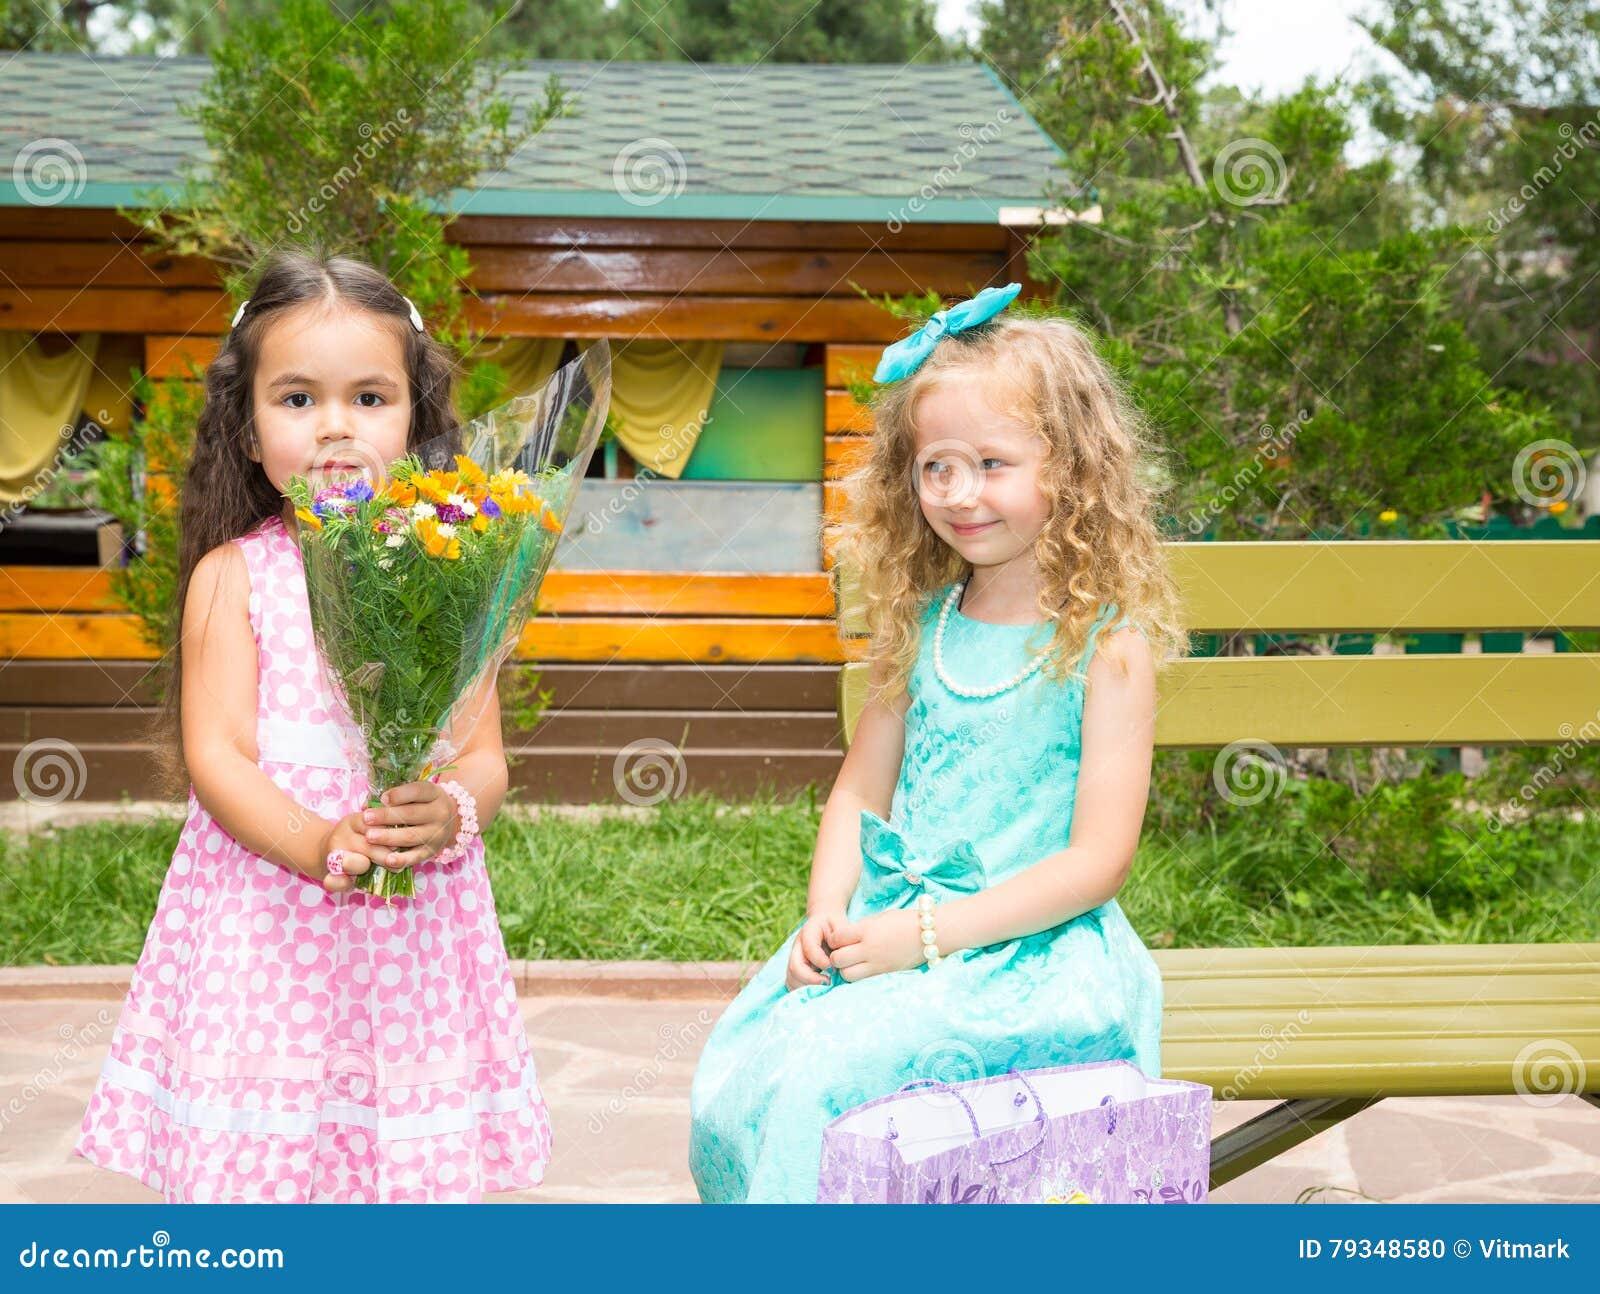 Two girlfriends. on happy birthday. Kid in park